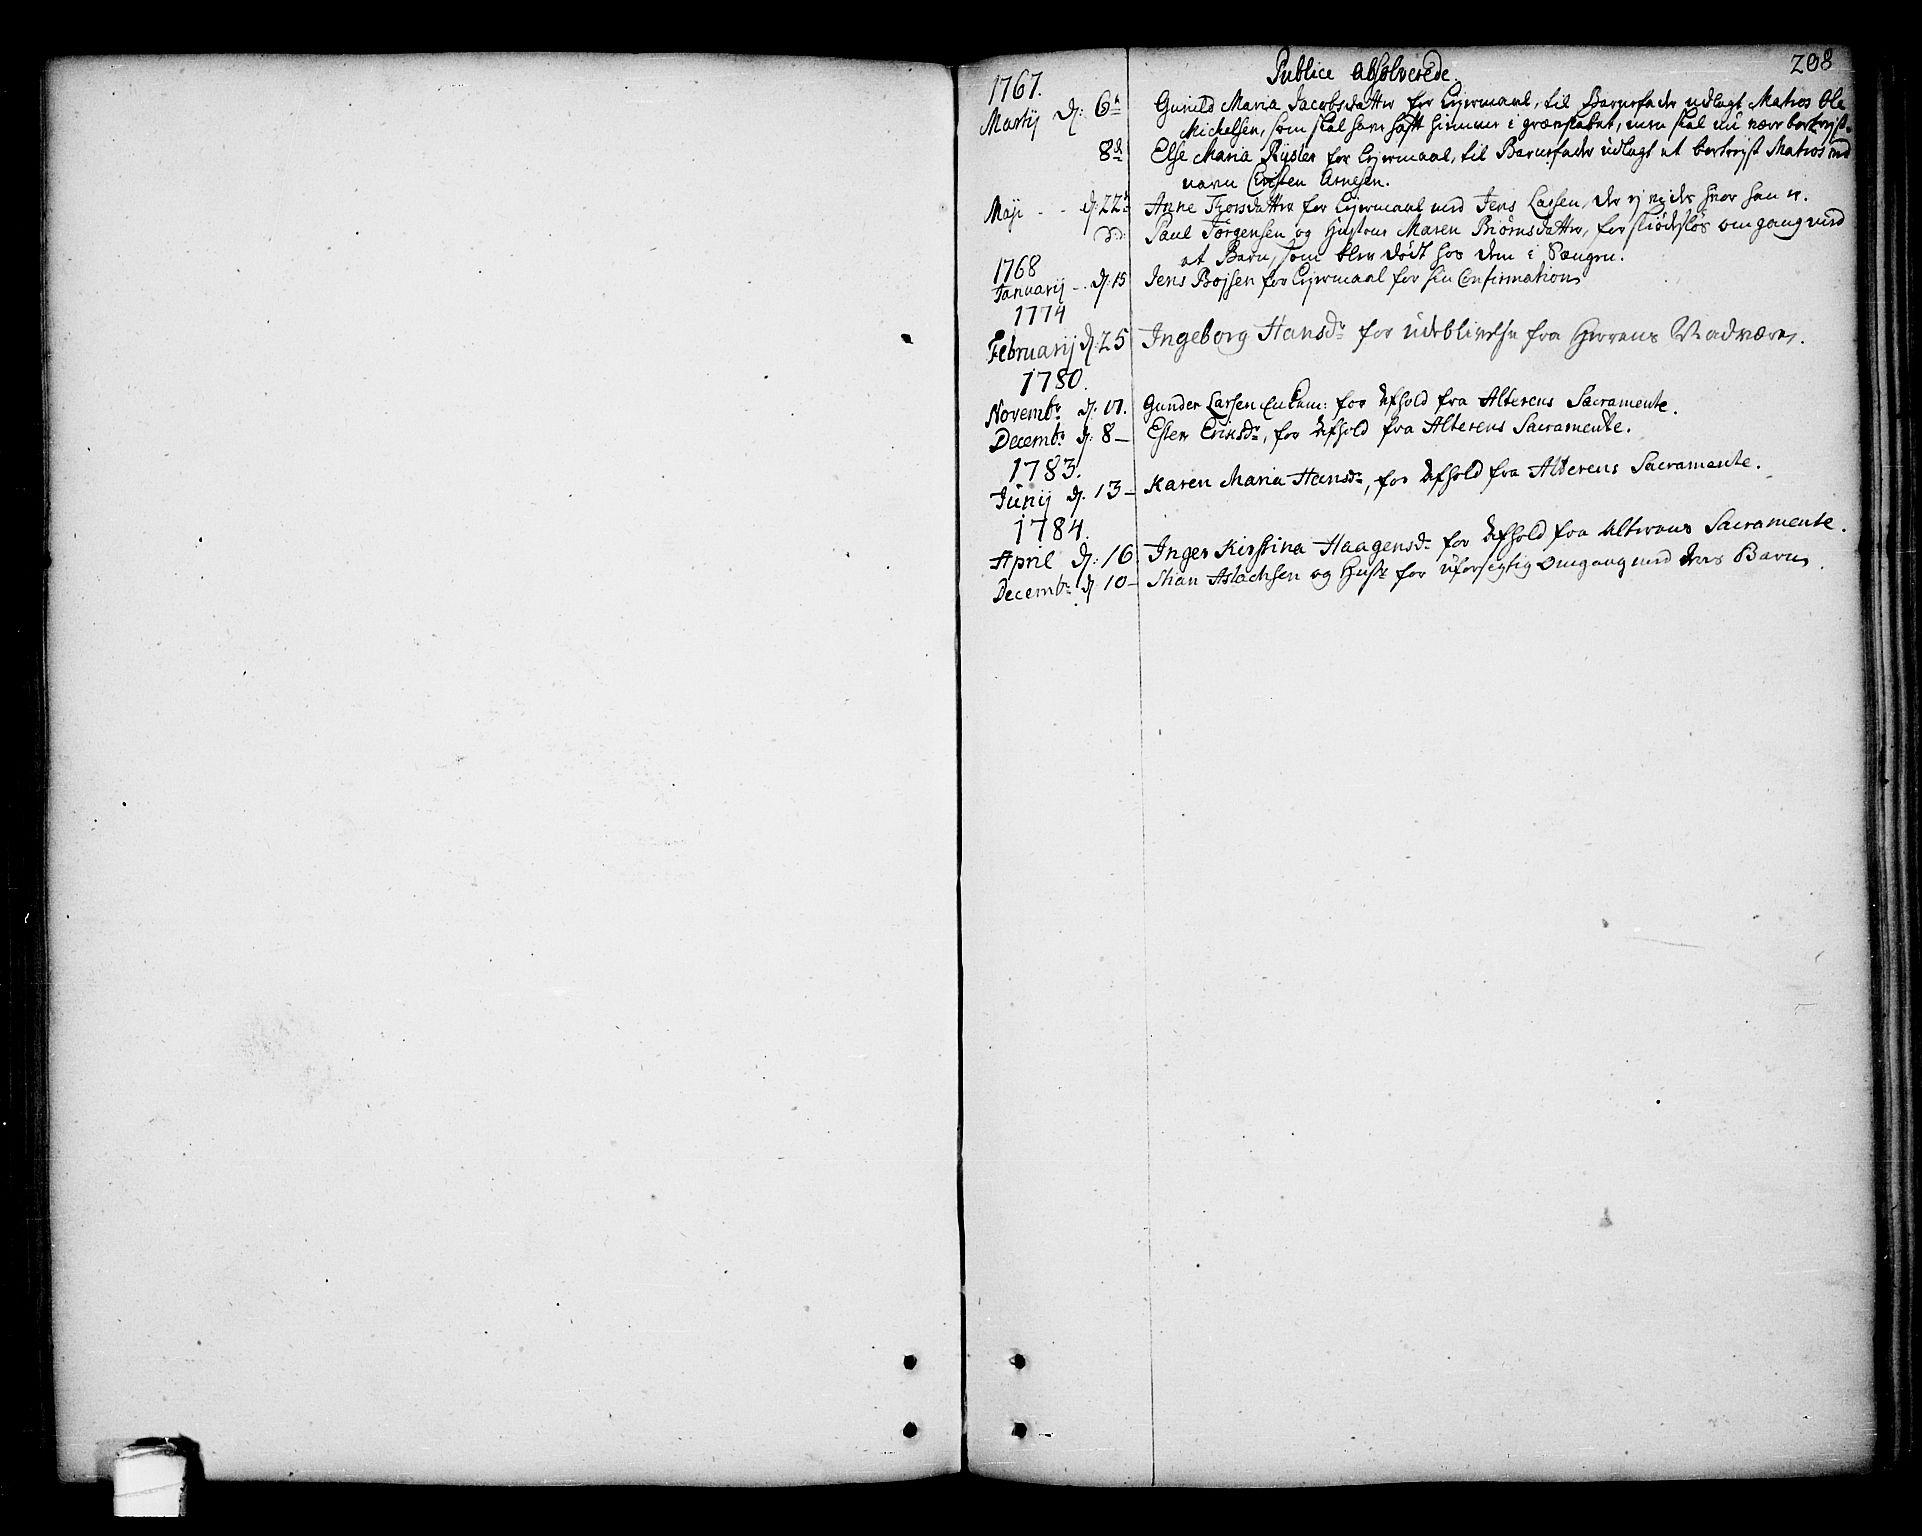 SAKO, Kragerø kirkebøker, F/Fa/L0002: Ministerialbok nr. 2, 1767-1802, s. 208